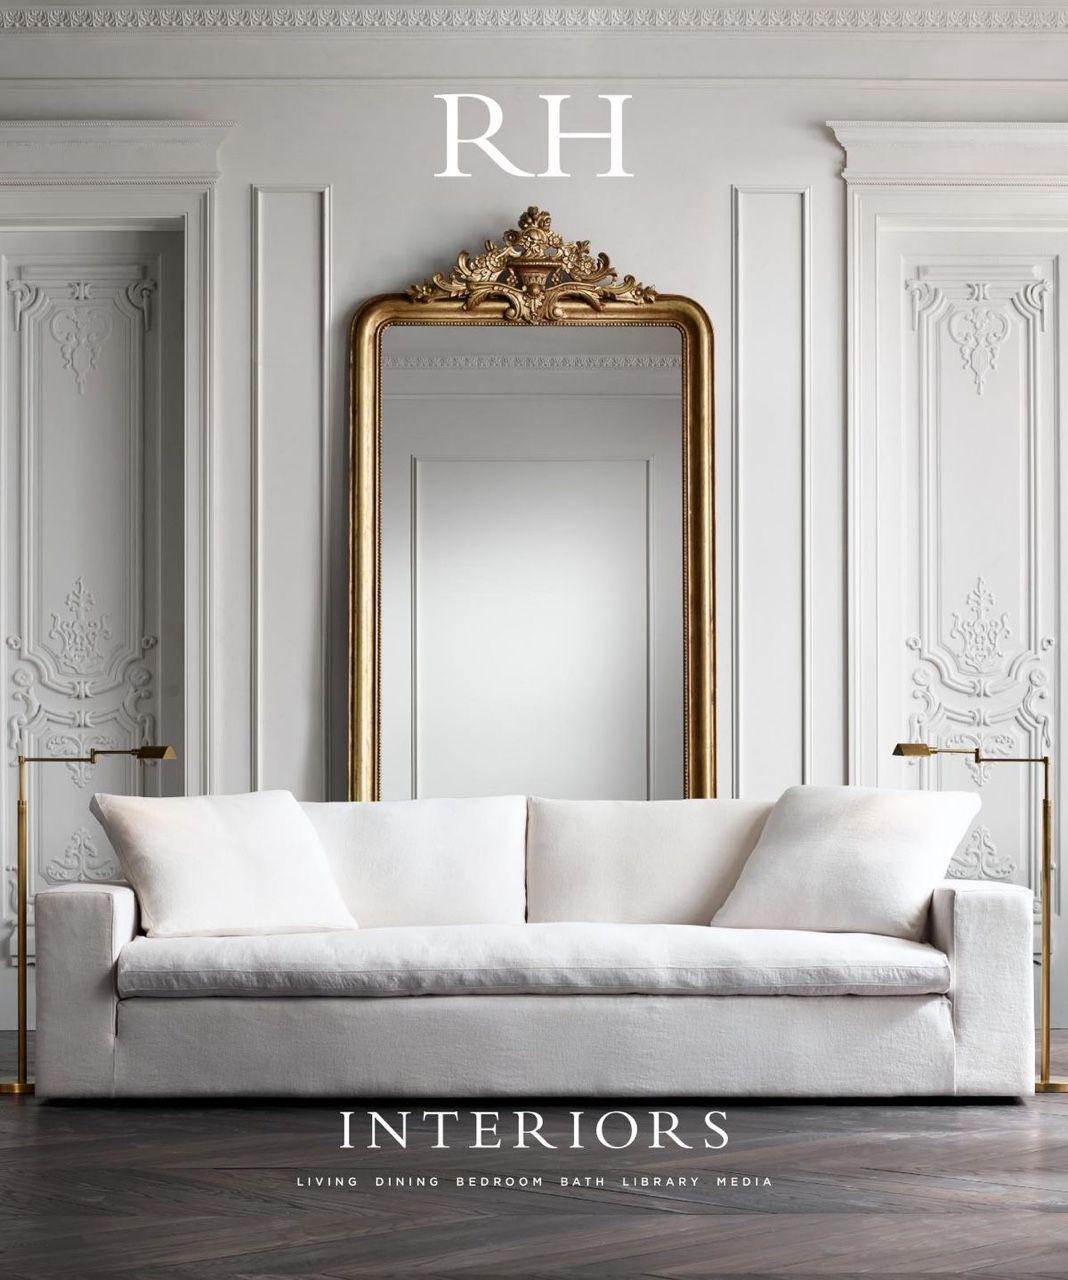 Paris, Prada, Pearls, Parfüm   Wohnen..   Pinterest   Interiors ...